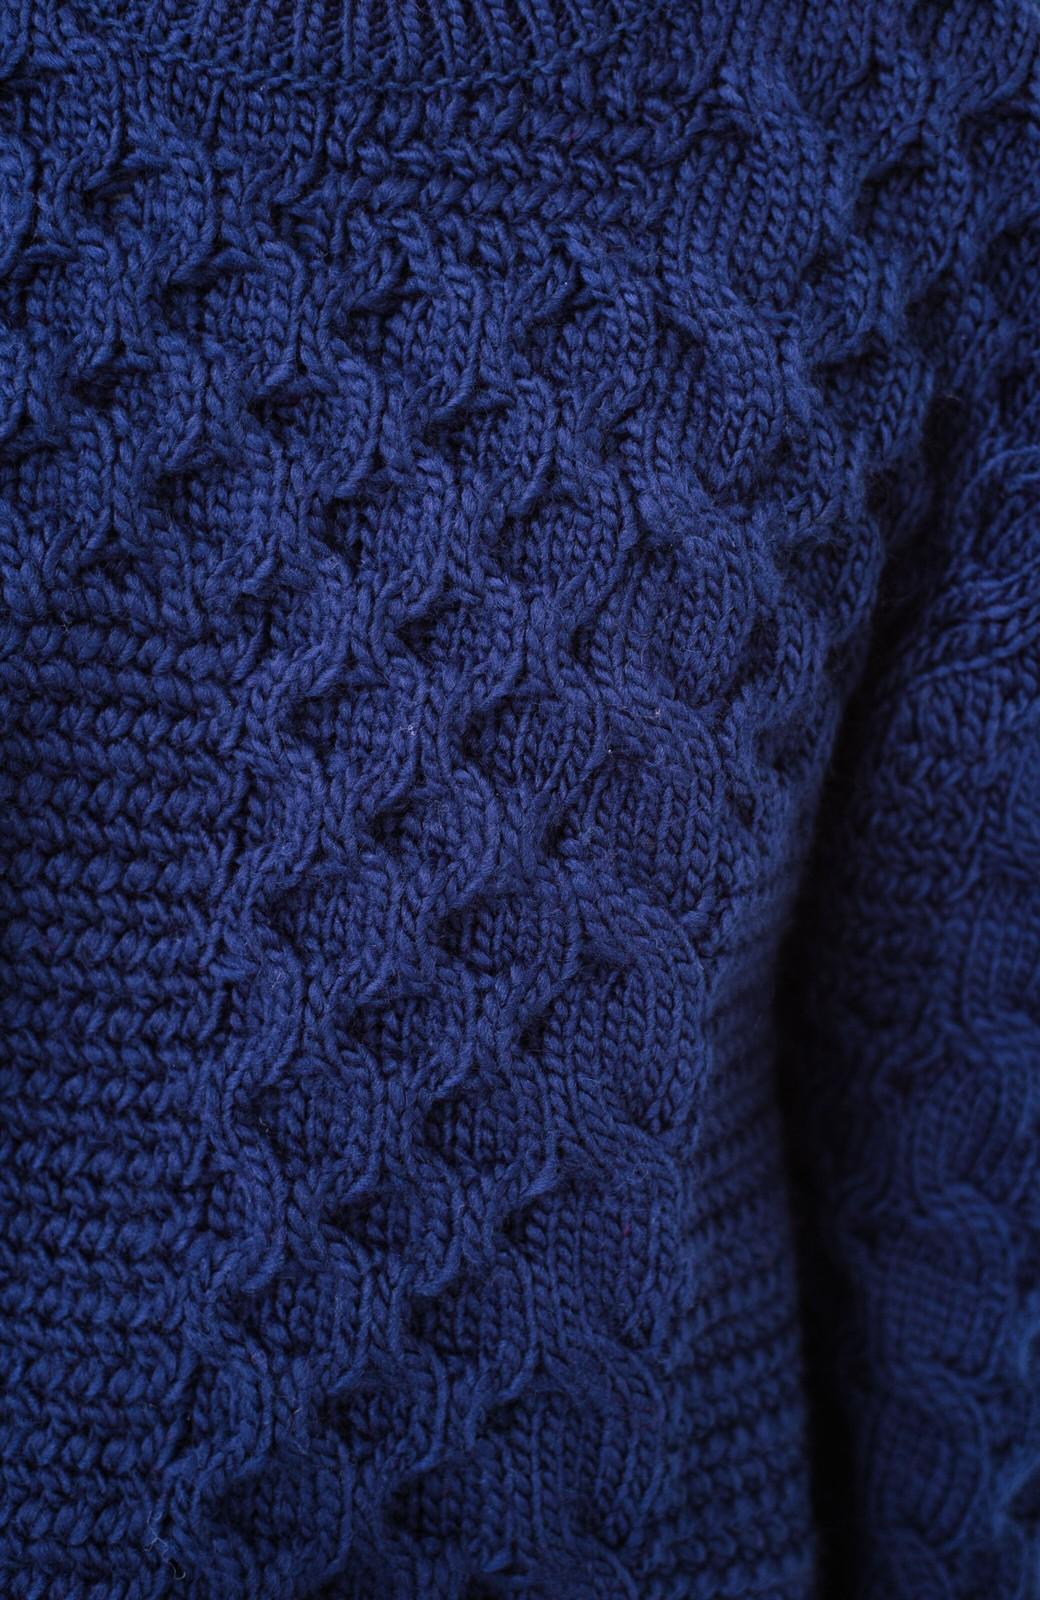 haco! 古着っぽい雰囲気がこなれたパネル編みケーブルニット <ネイビー>の商品写真7